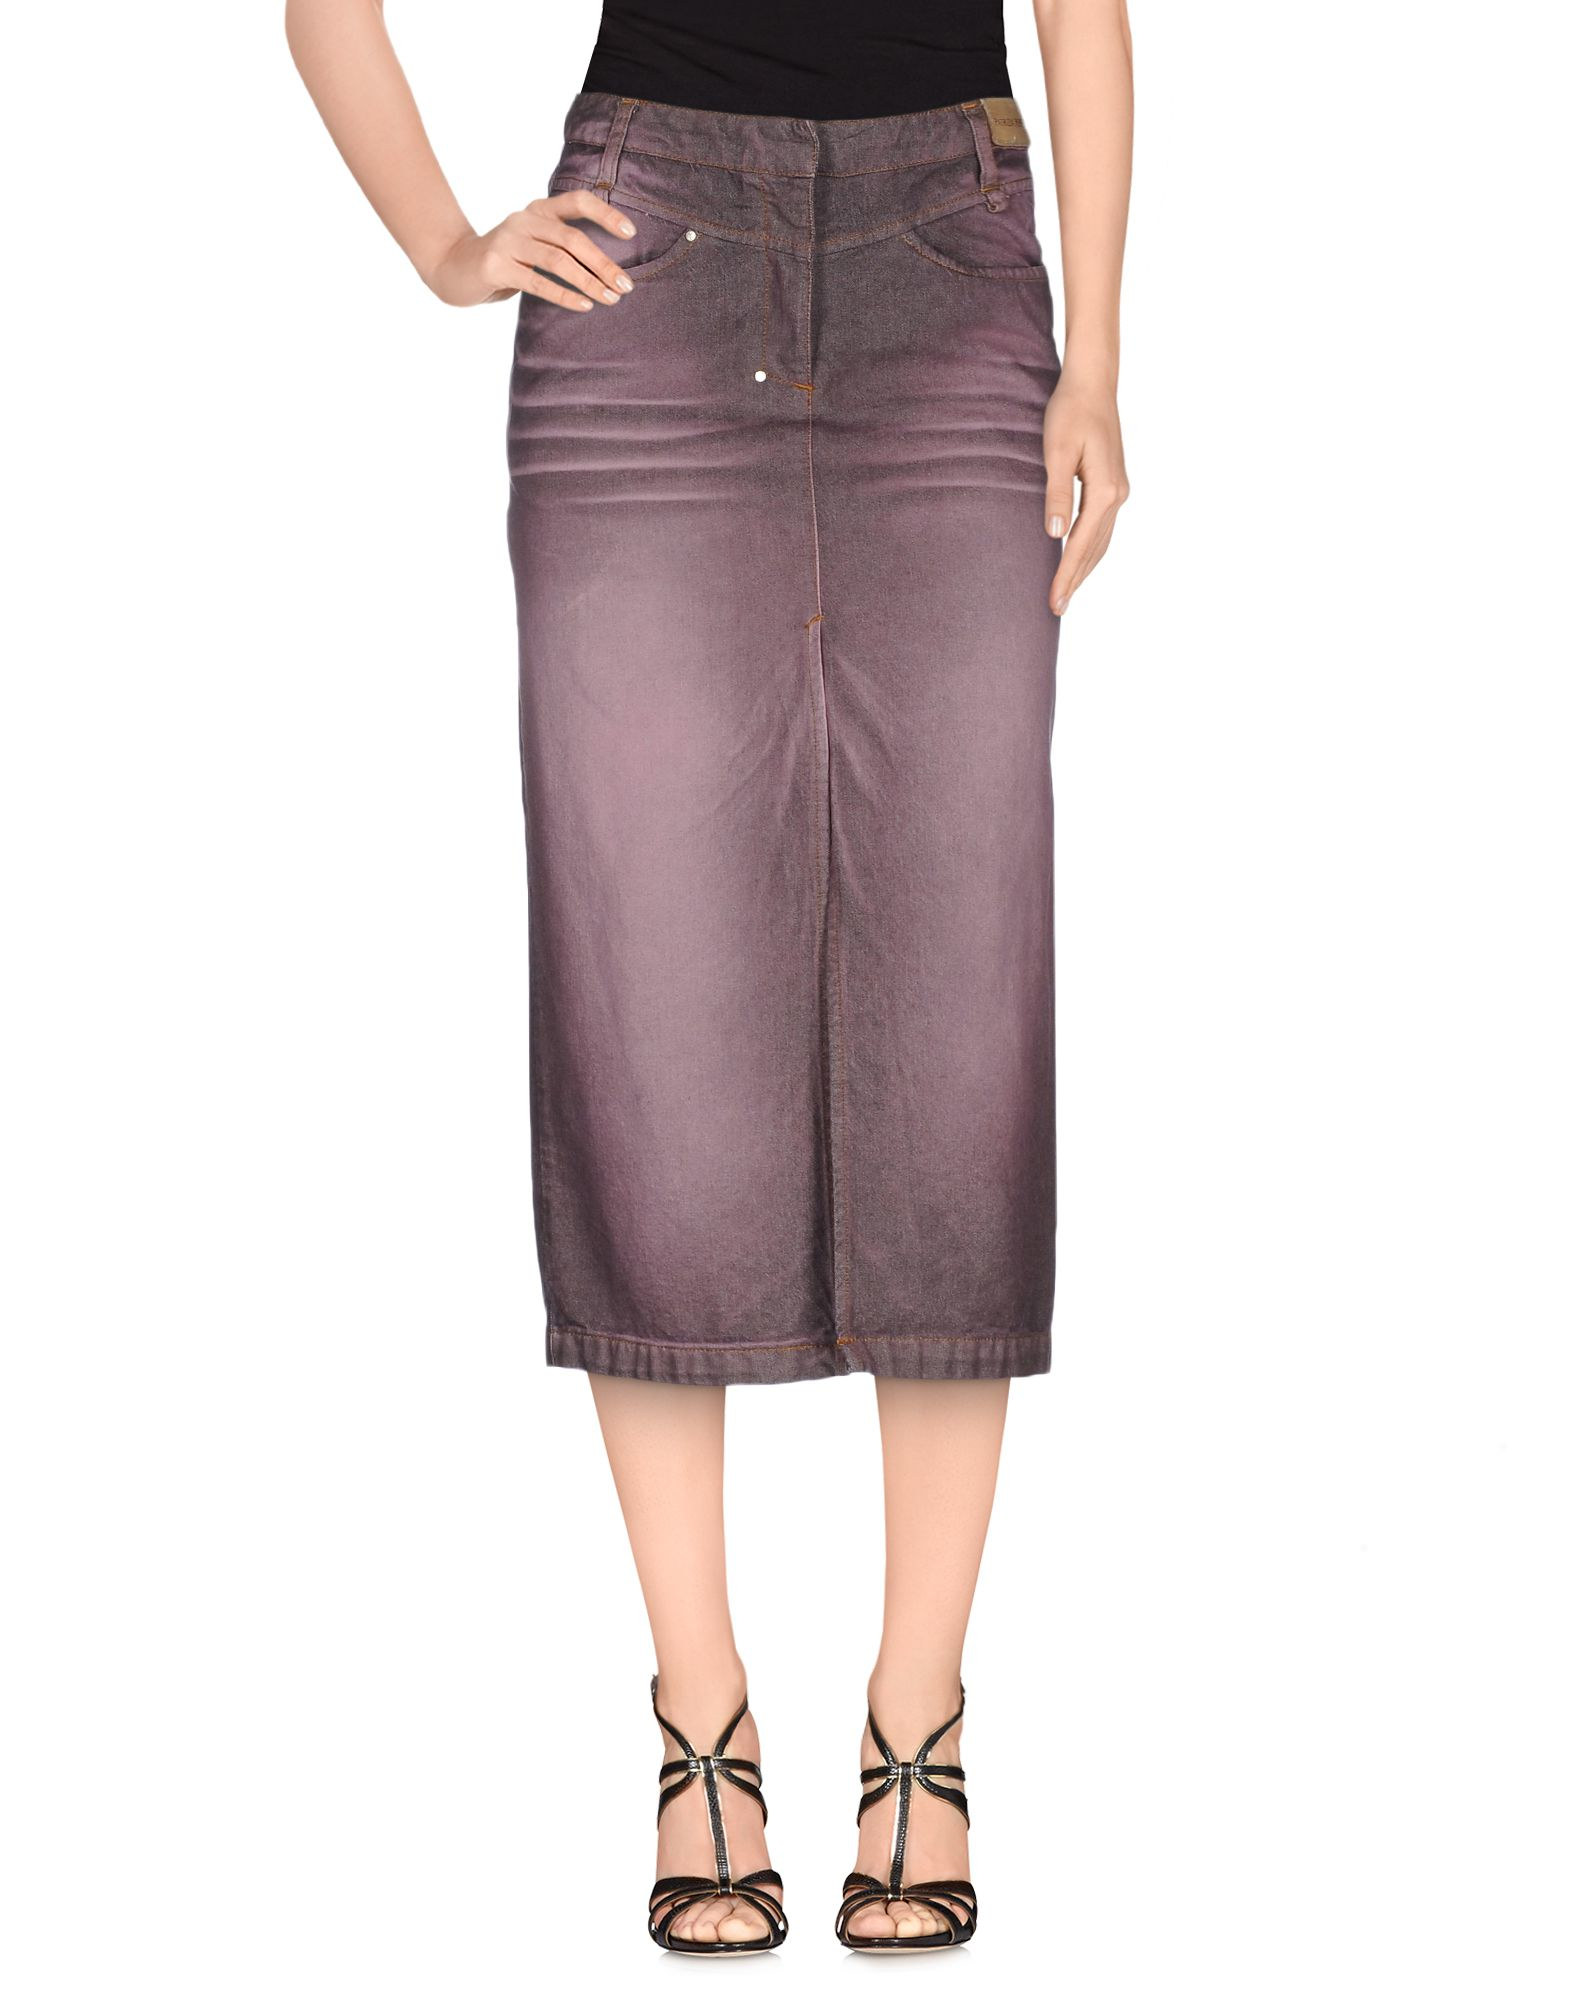 patrizia pepe denim skirt in purple lyst